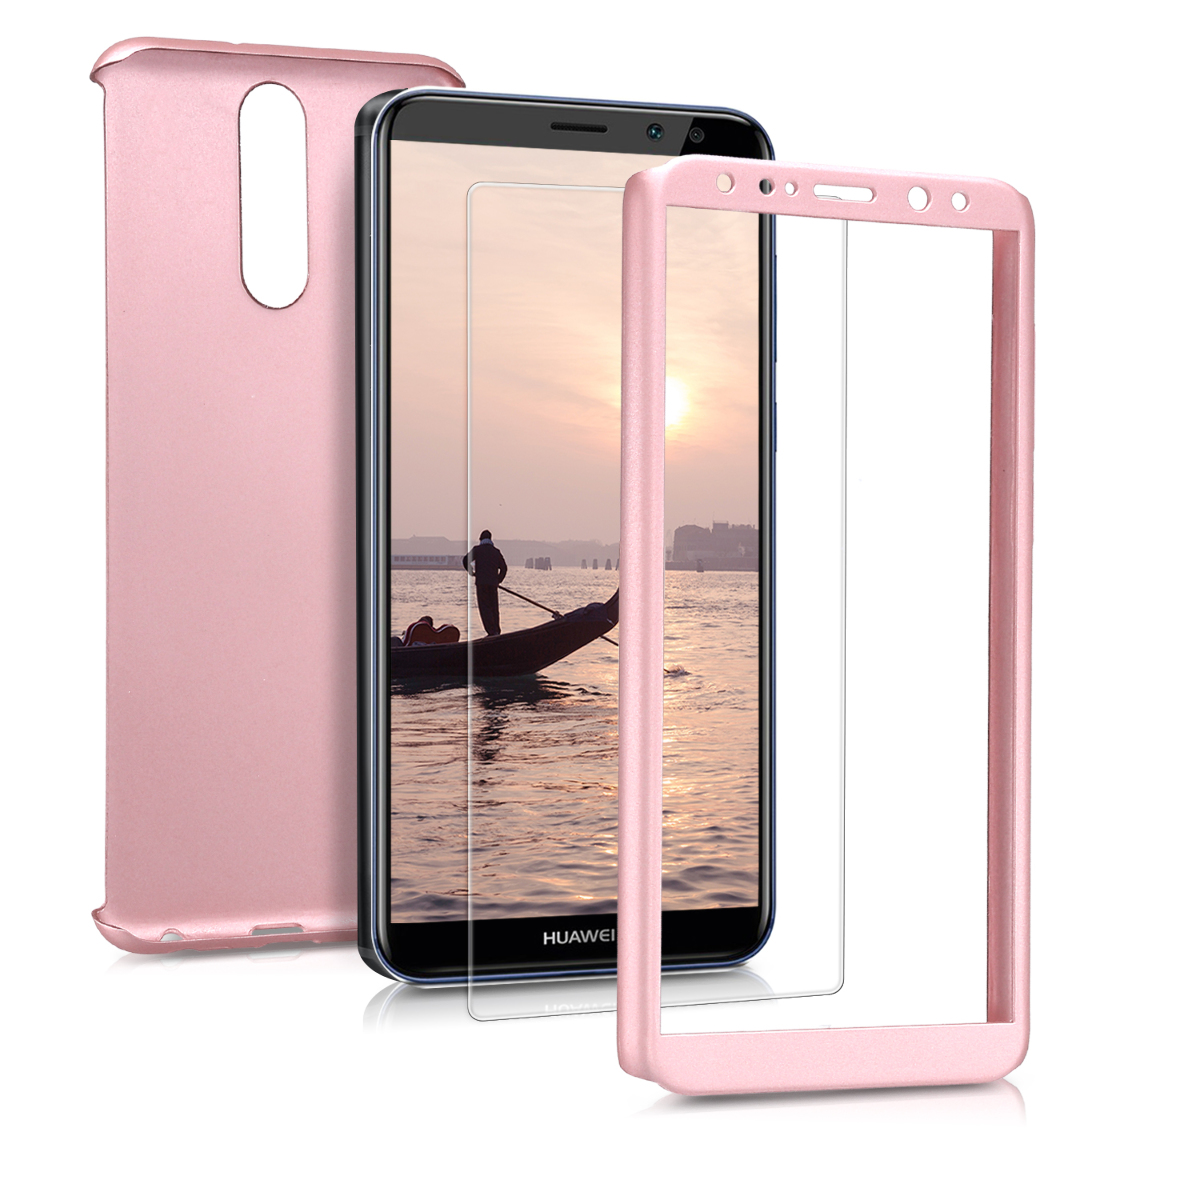 KW Θήκη Full Body για Huawei Mate 10 Lite & Tempered Glass - Metallic Rose Gold (46385.31)